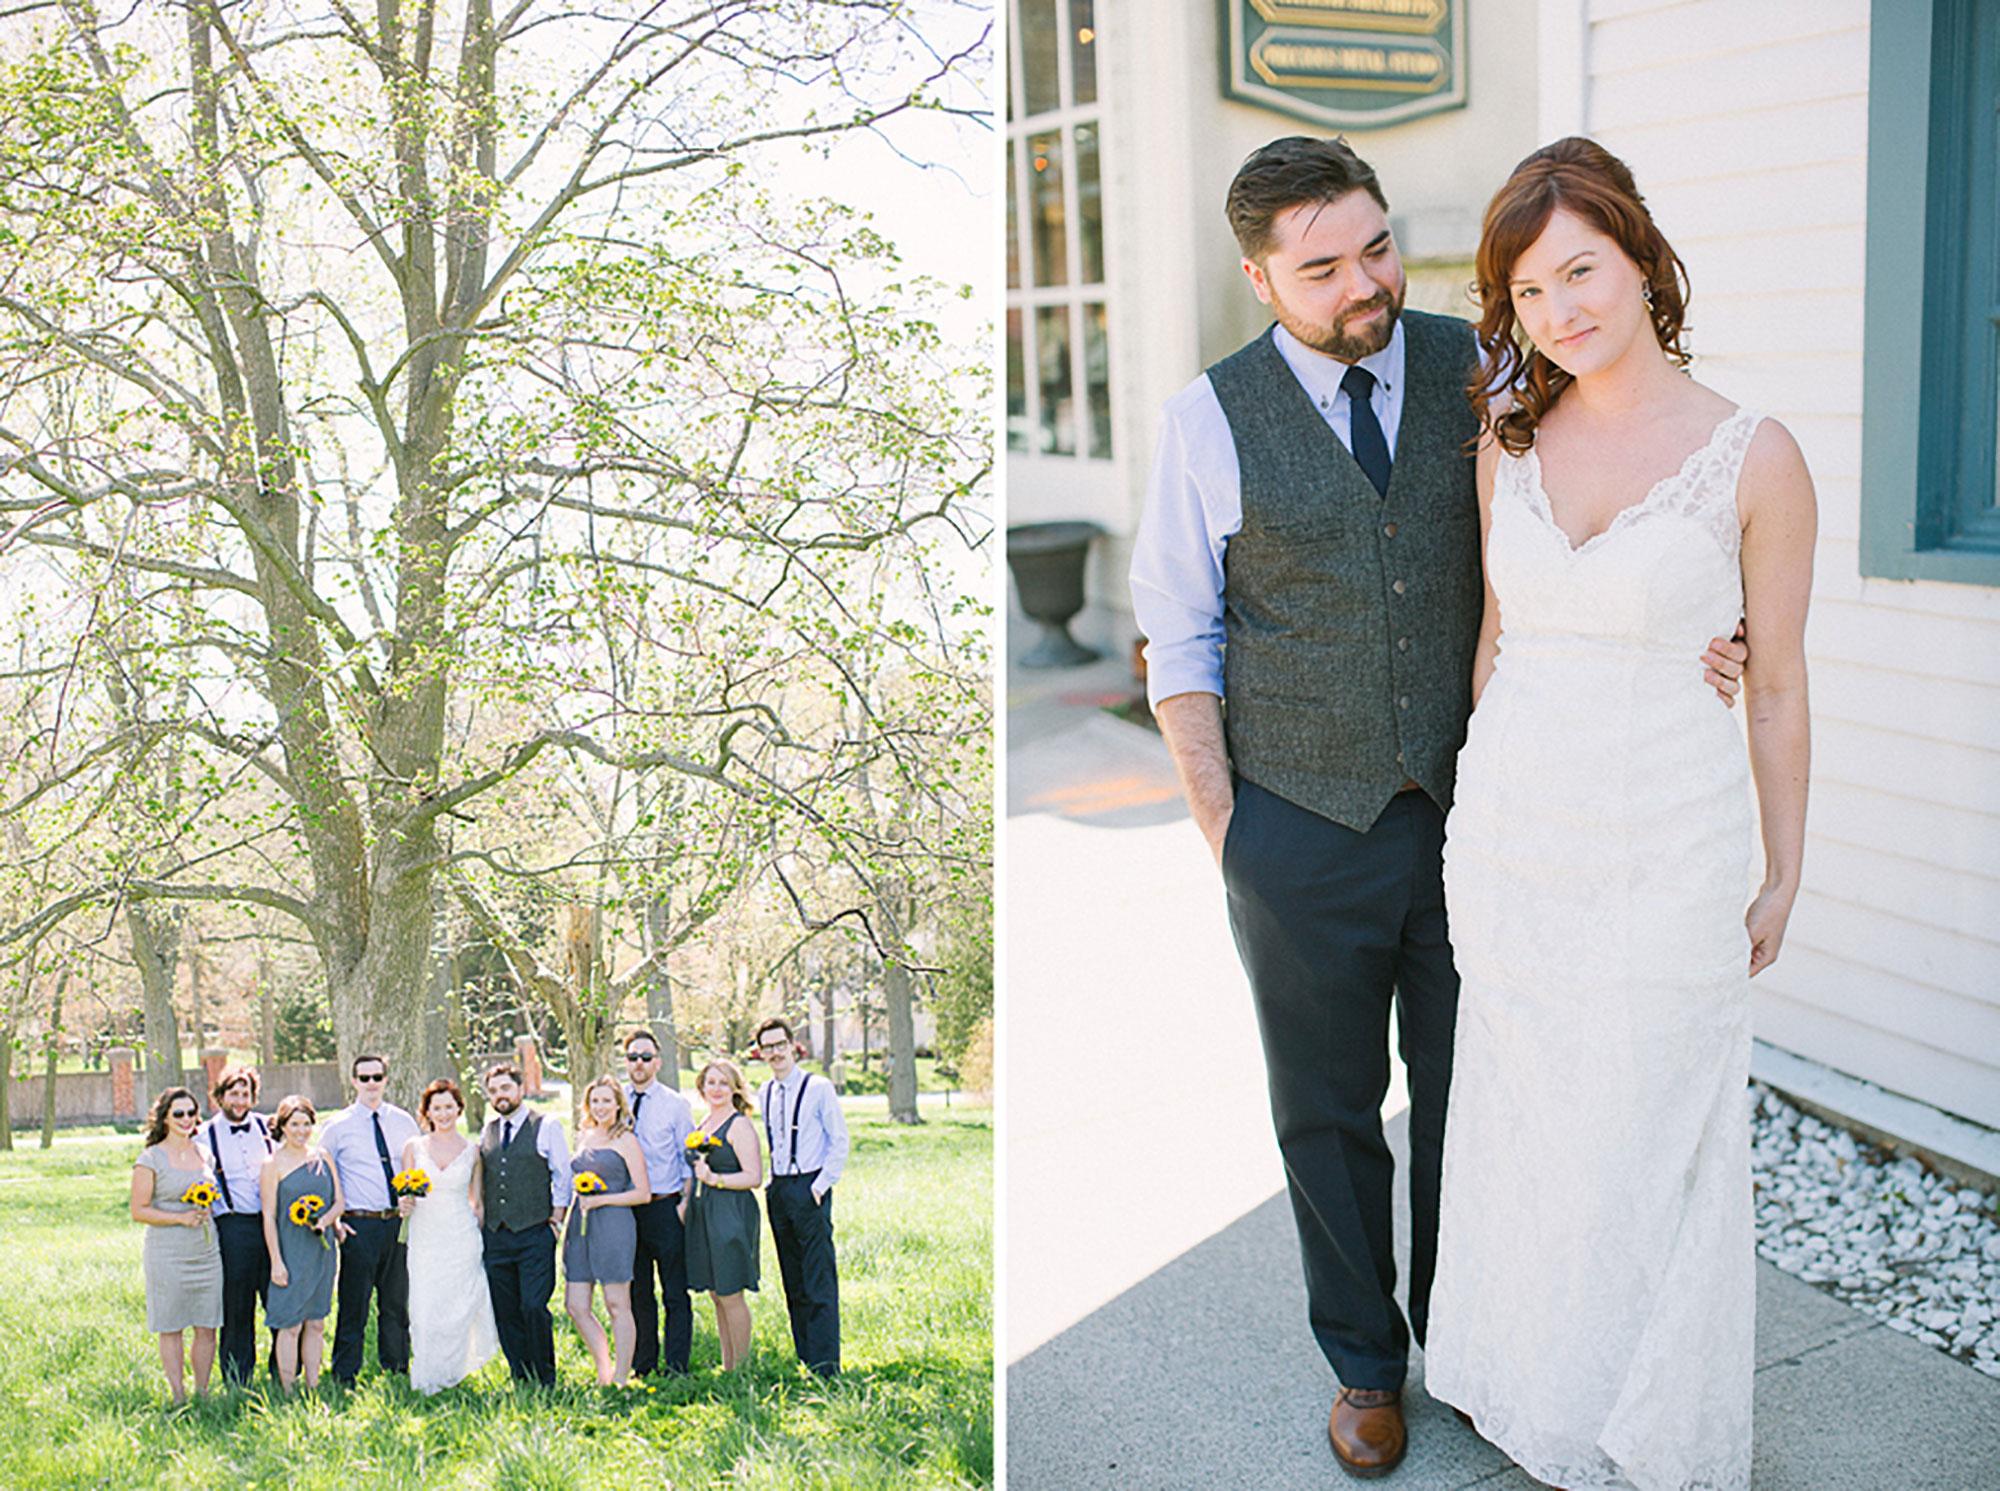 Navy-Hall-Wedding-Vineyard-Bride-Photo-By-Andrew-Mark-Photography-020.jpg